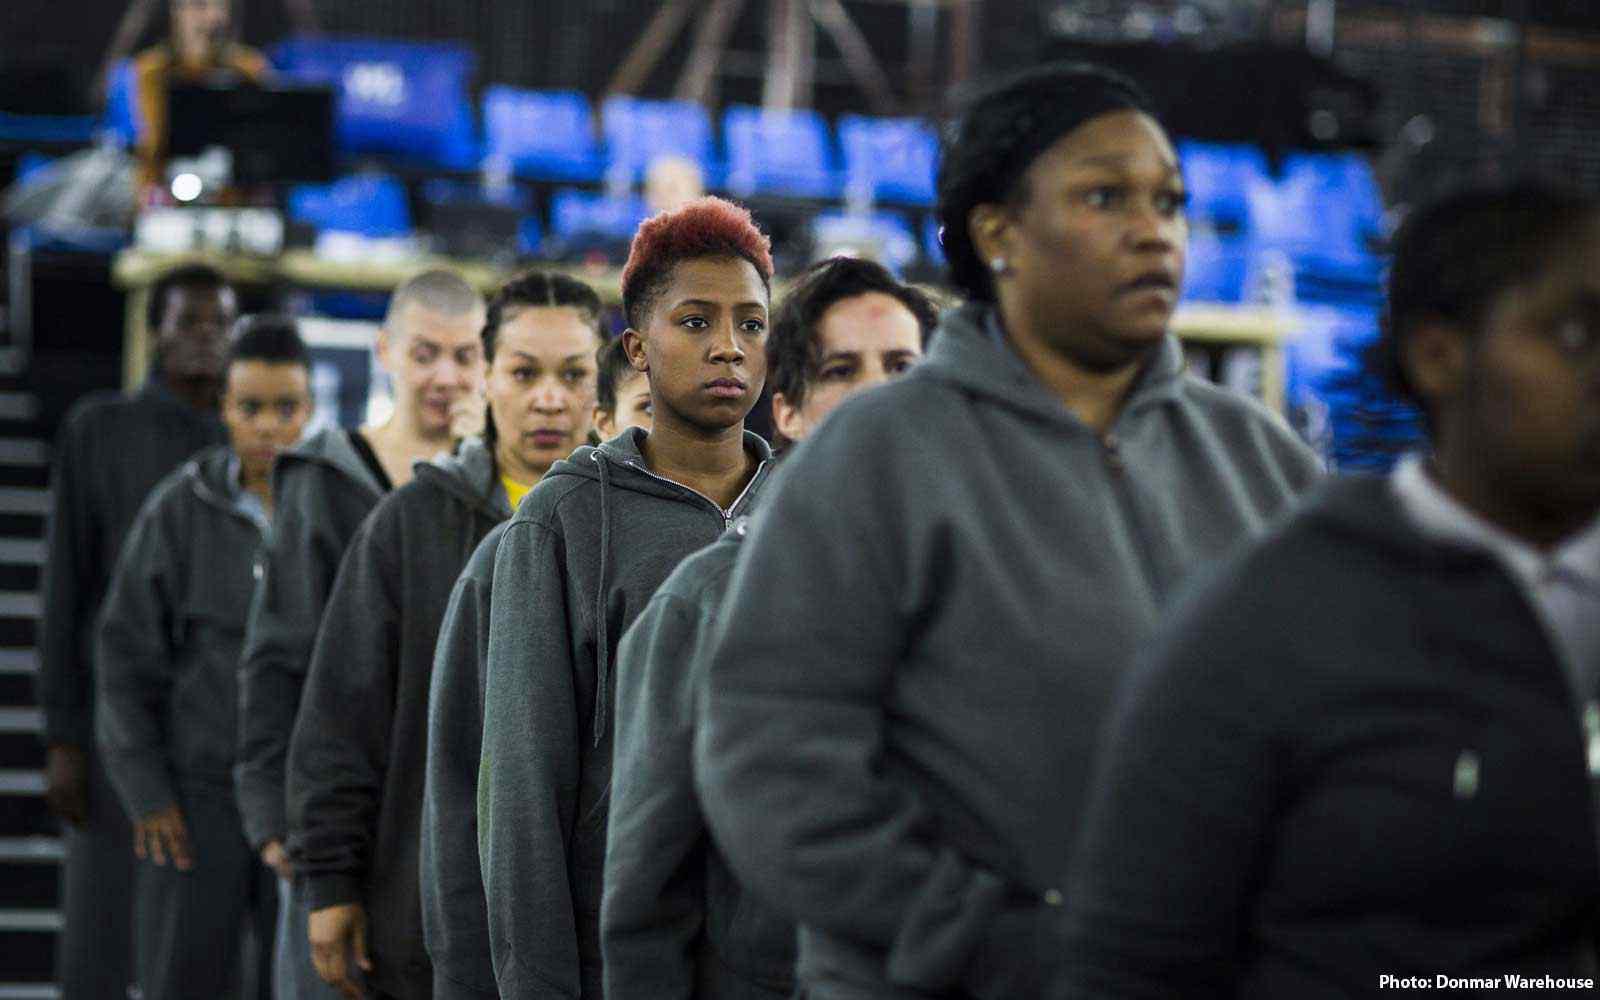 Actors in prison setting, queuing